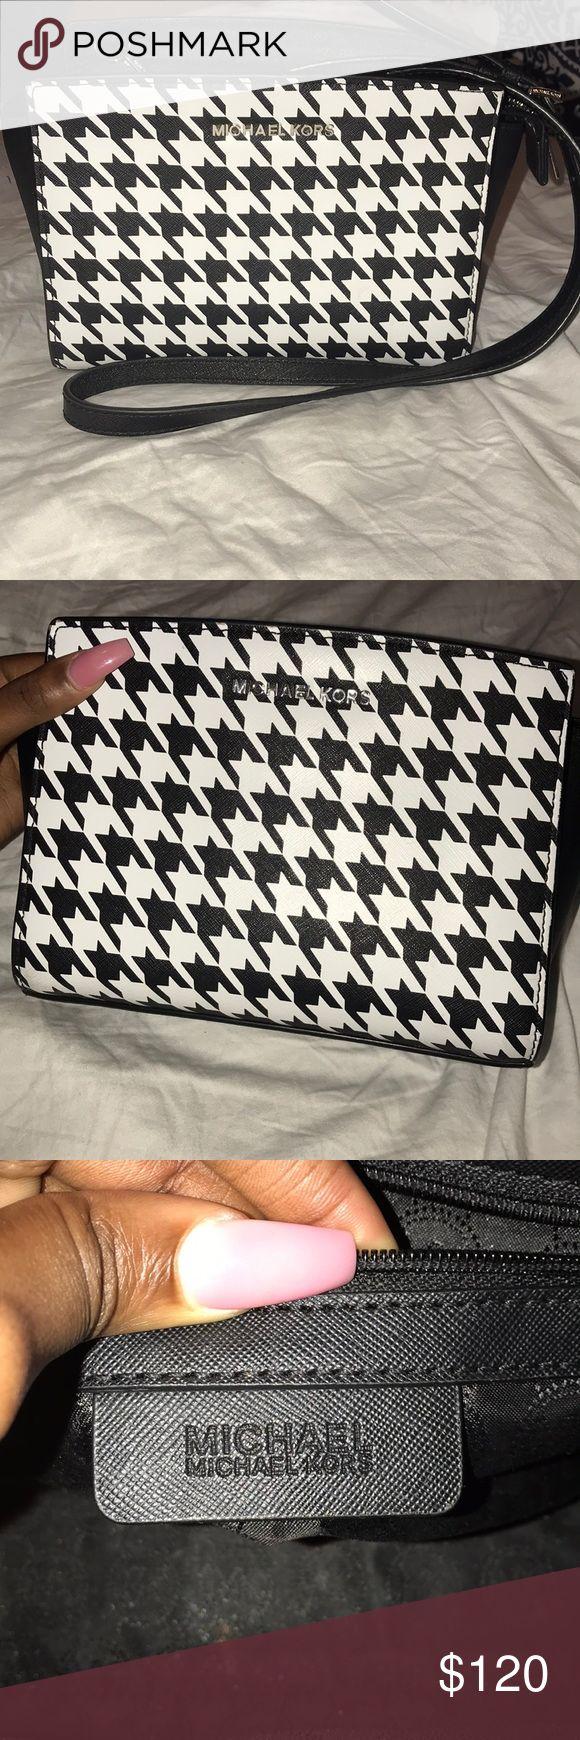 Micheal Kors Crossbody Handbag Black and White Micheal Kors Crossbody Handbag 100% Authenticate KORS Michael Kors Bags Crossbody Bags